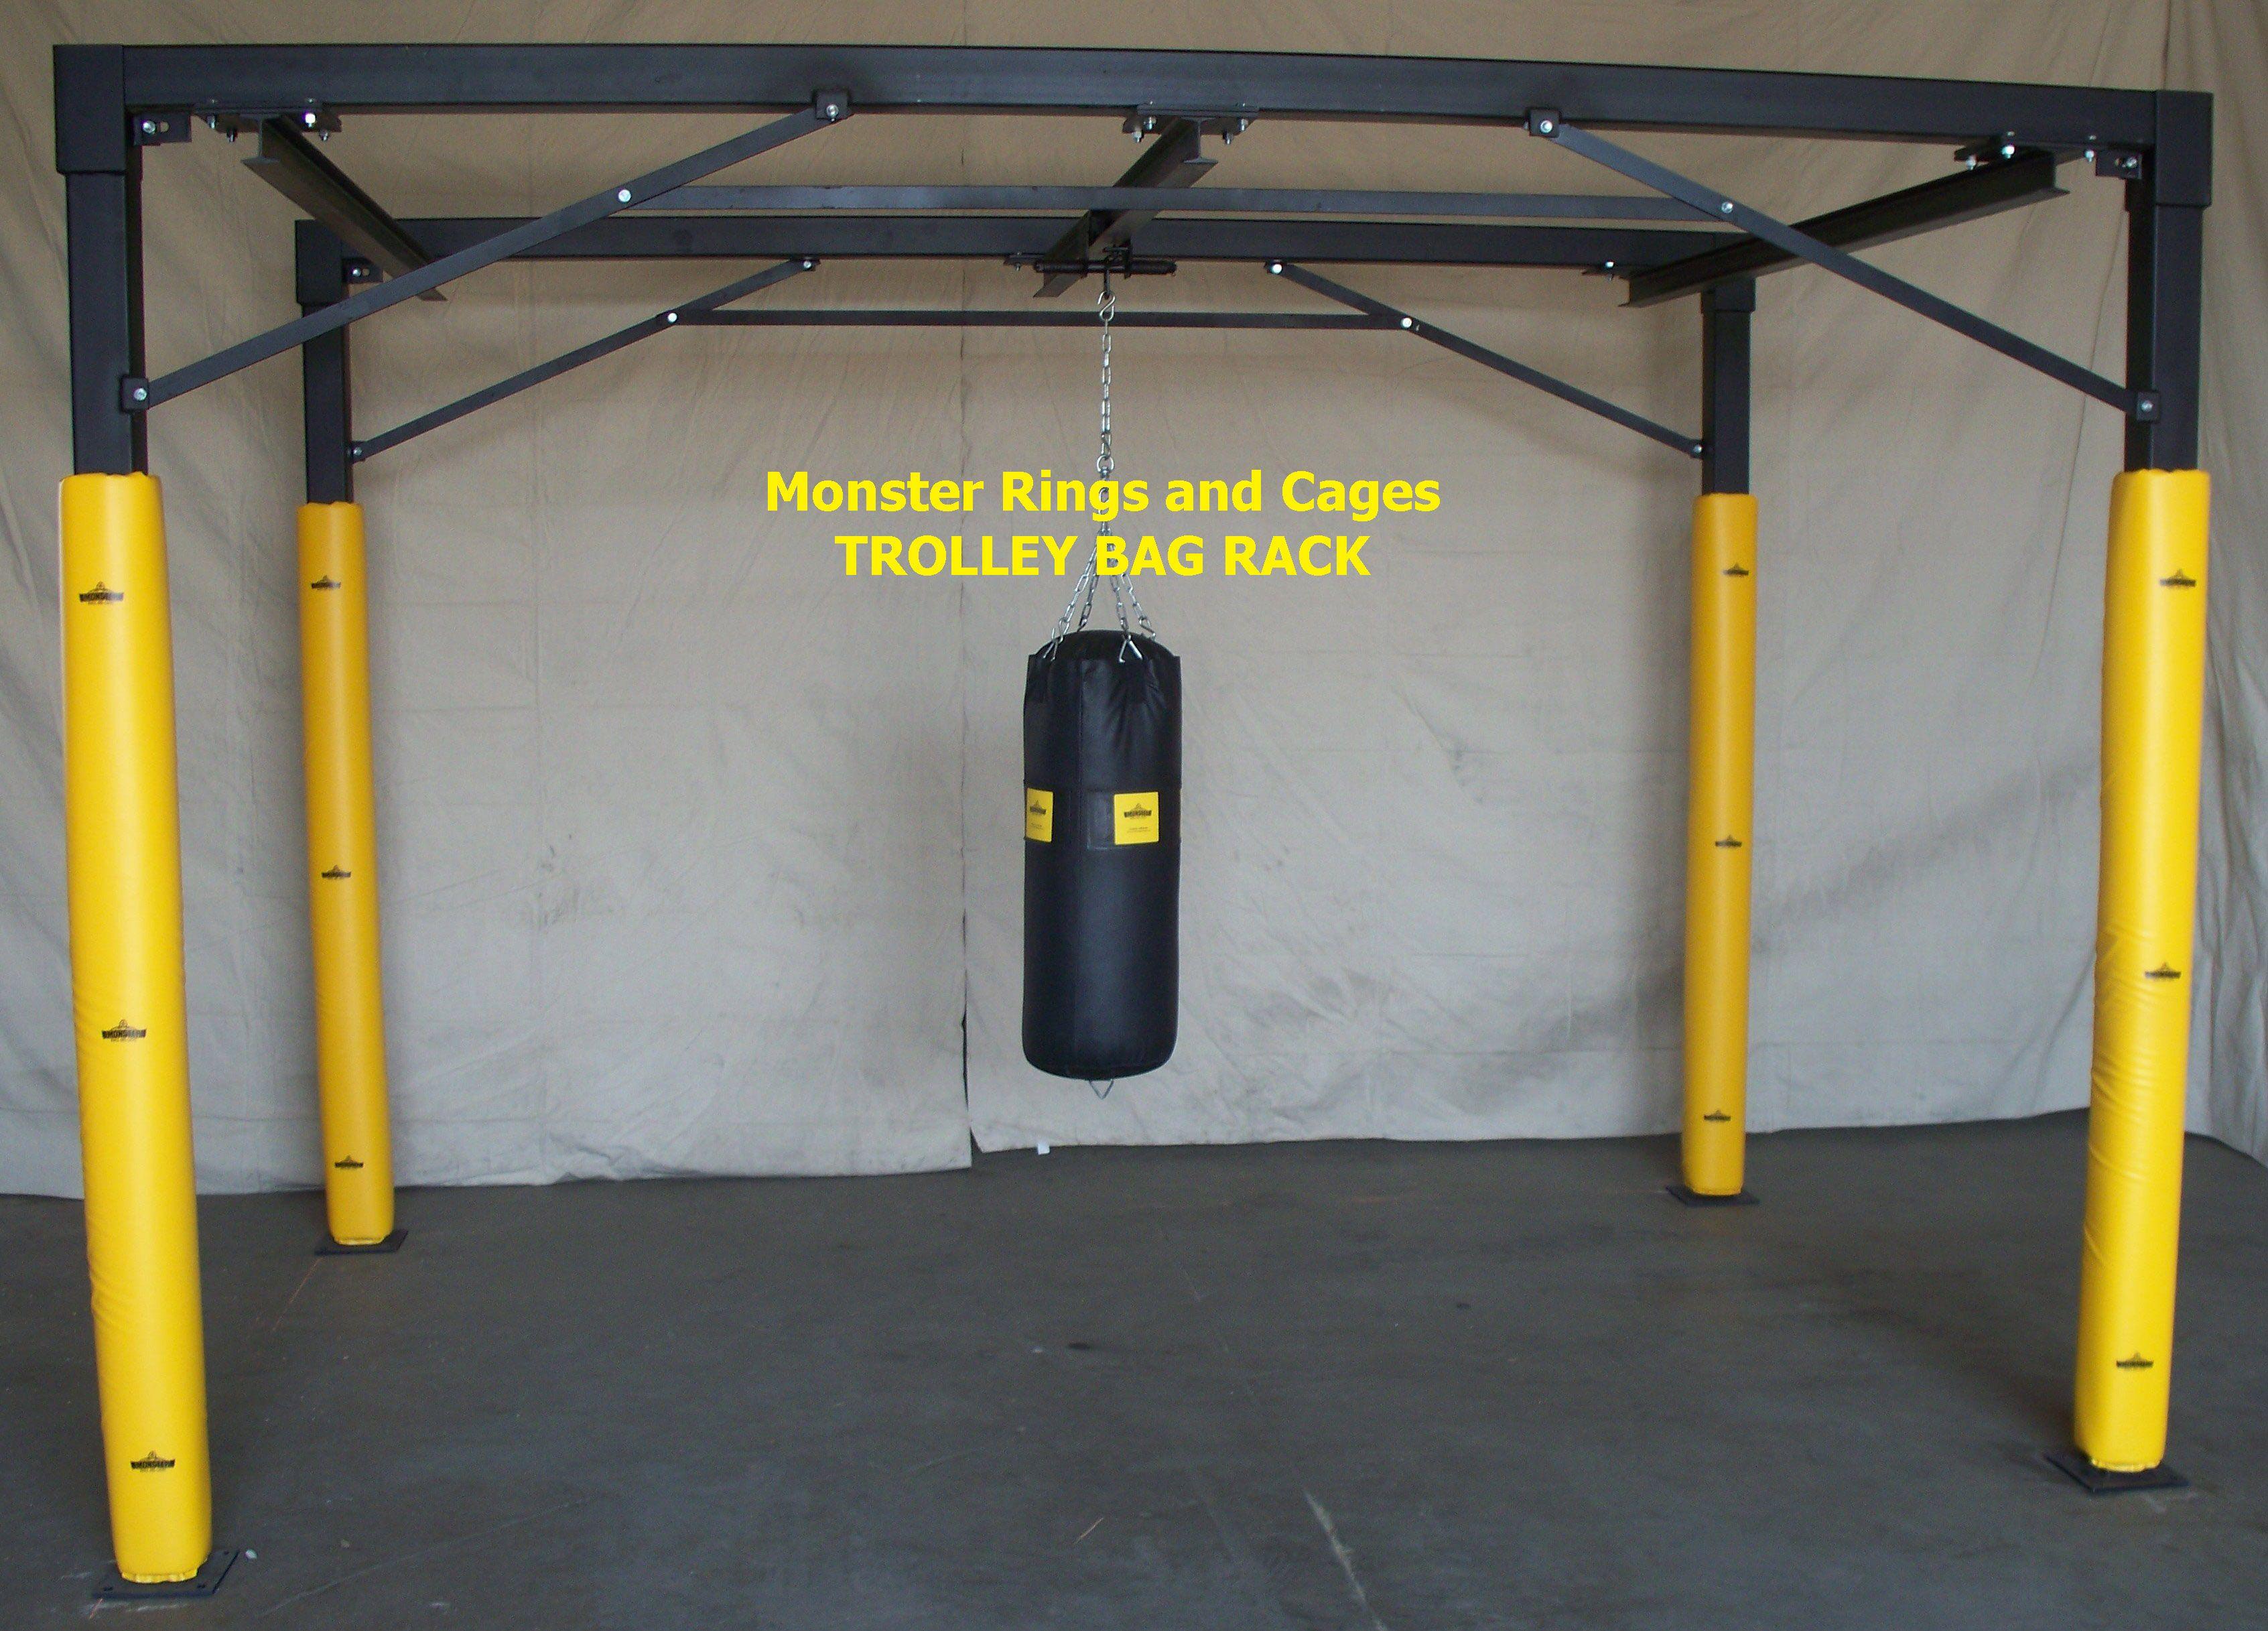 rolling trolley bag racks gym setup